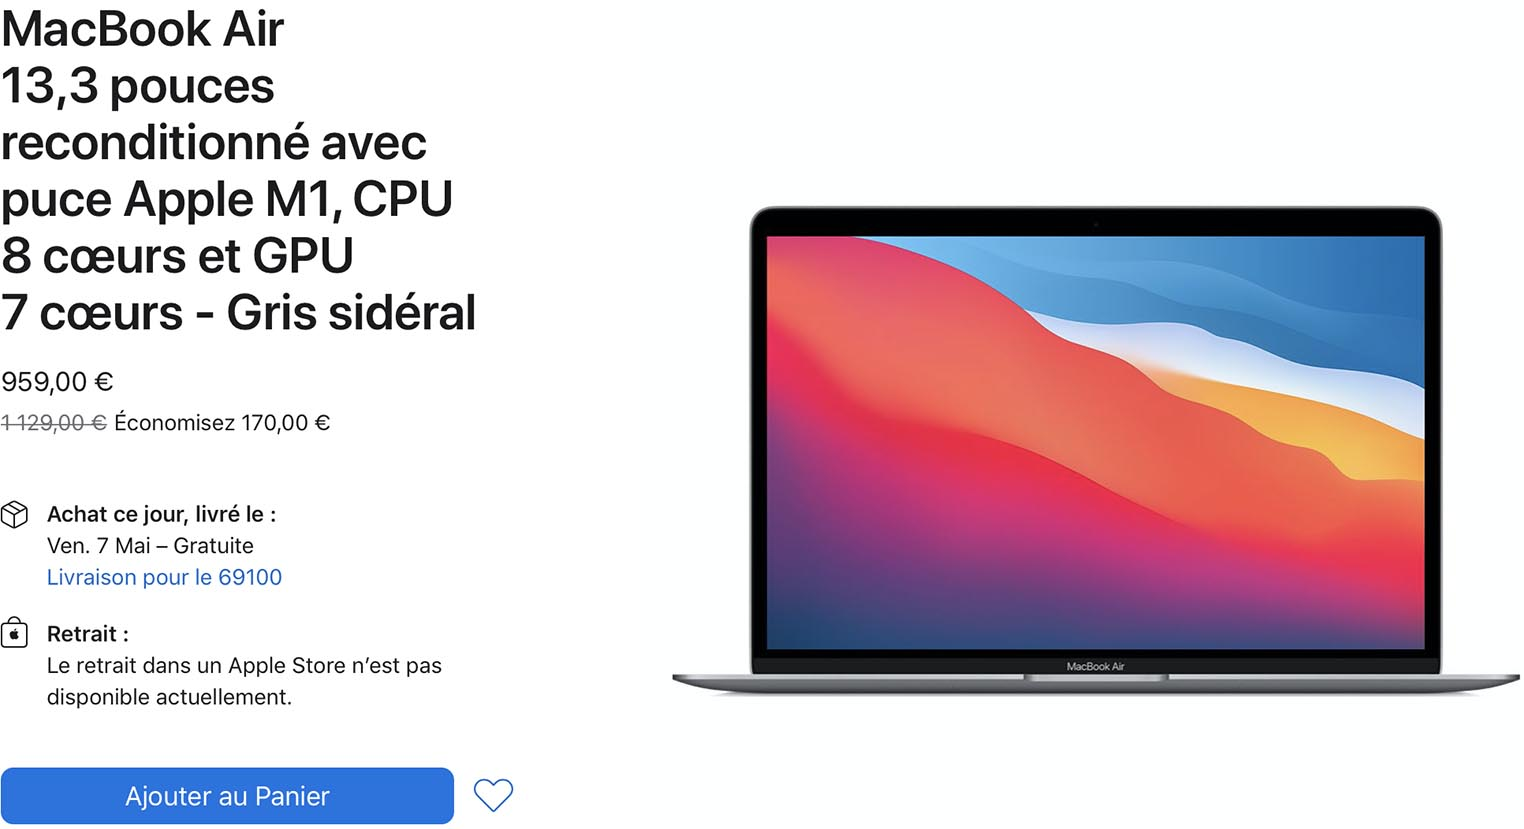 MacBook Air Refurb Store